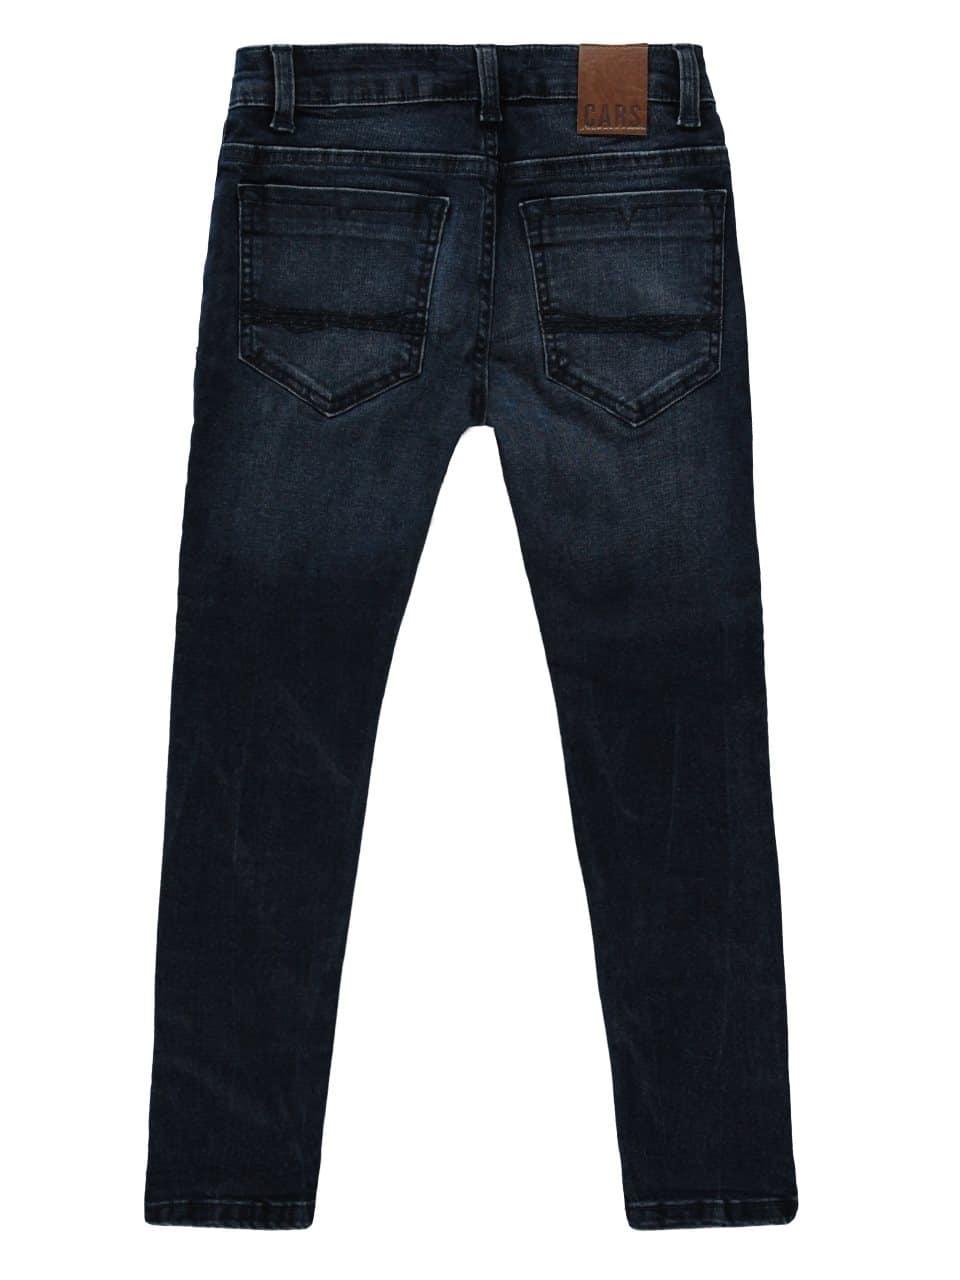 Cars Jeans Davis Black Blue